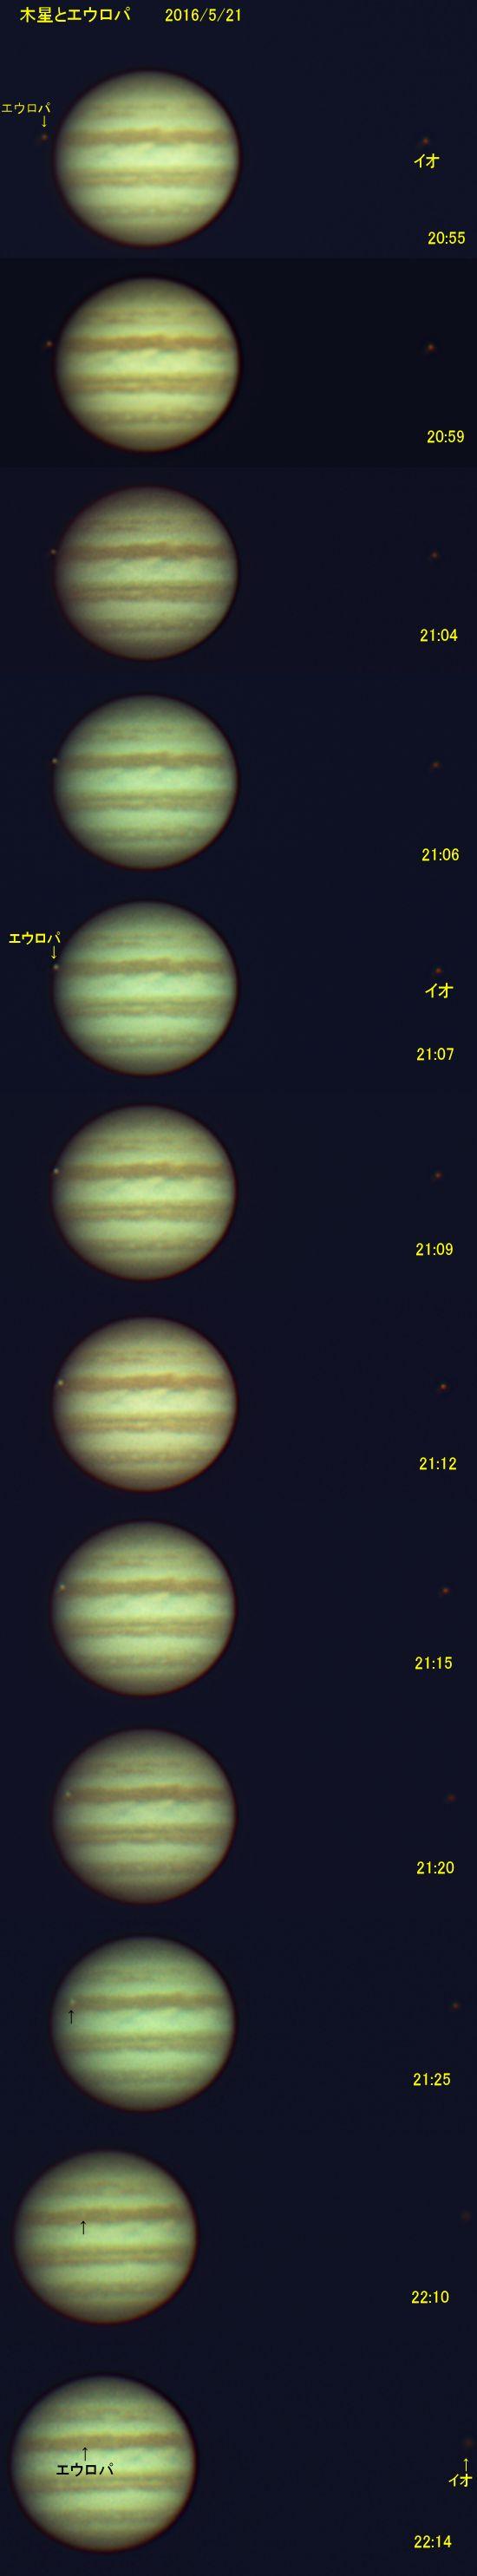 木星_20160521I_2055_2214